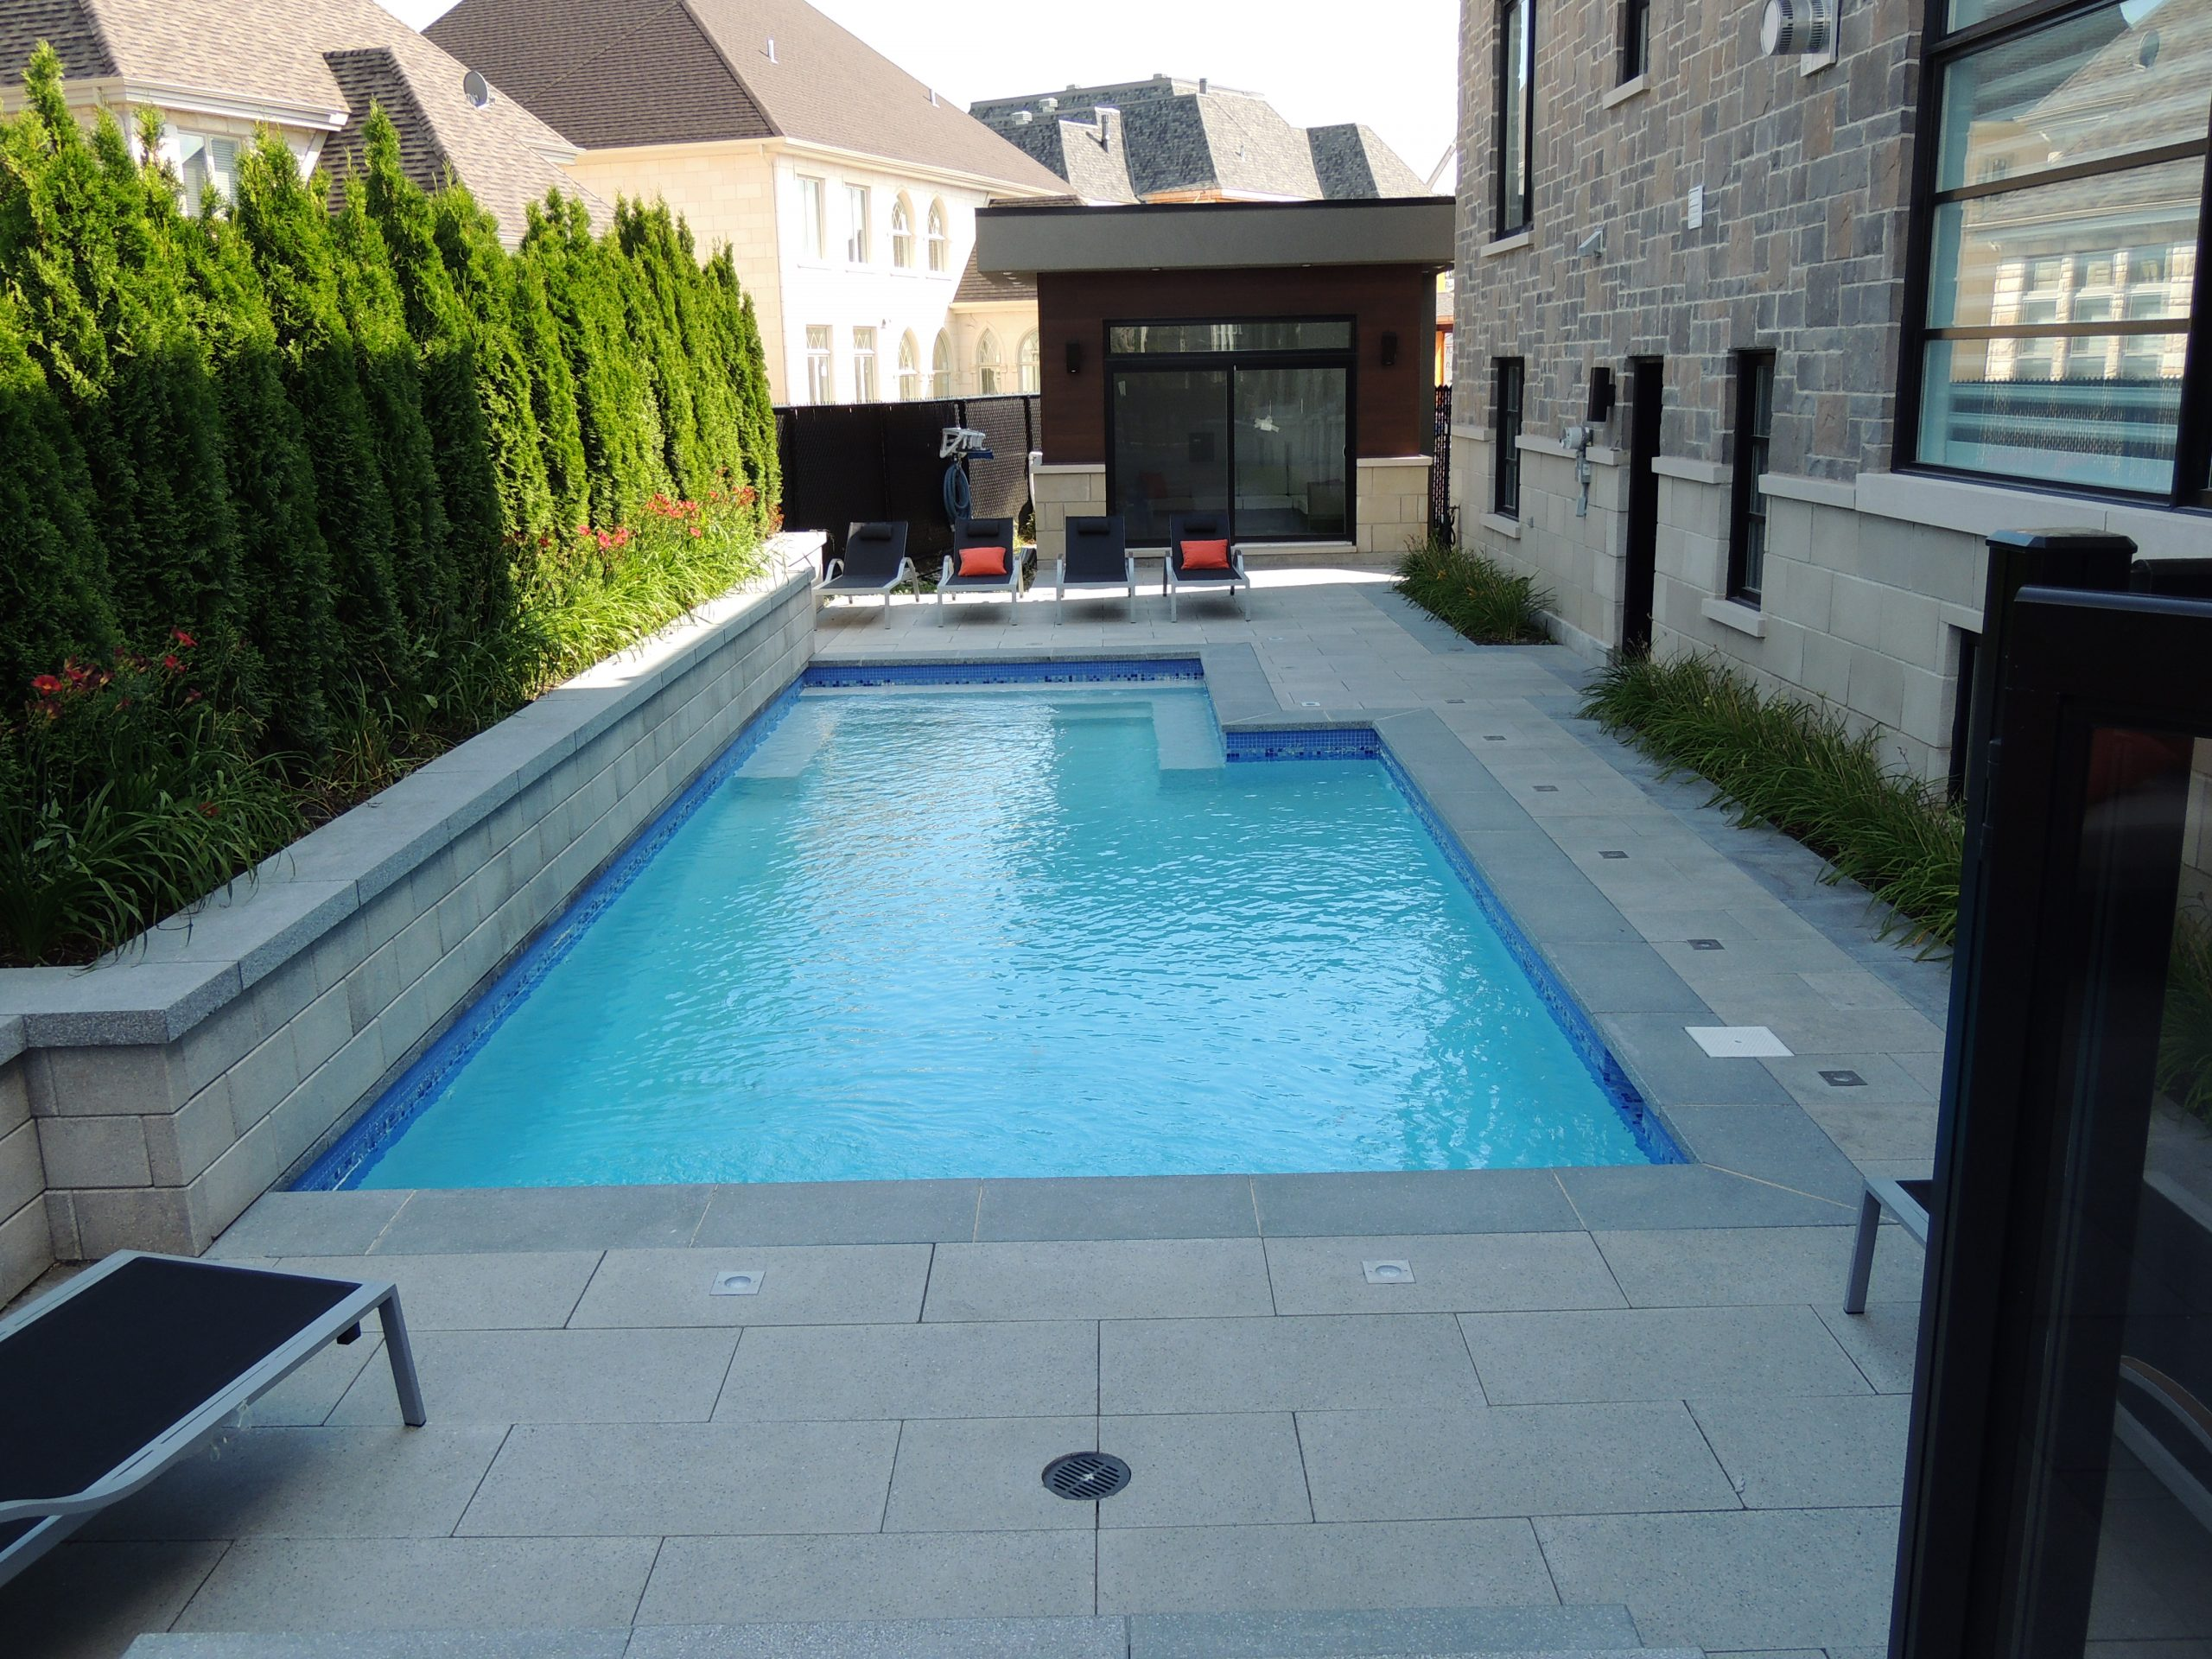 Pavé & paysagiste Boisbriand - Résidentiel - Piscine